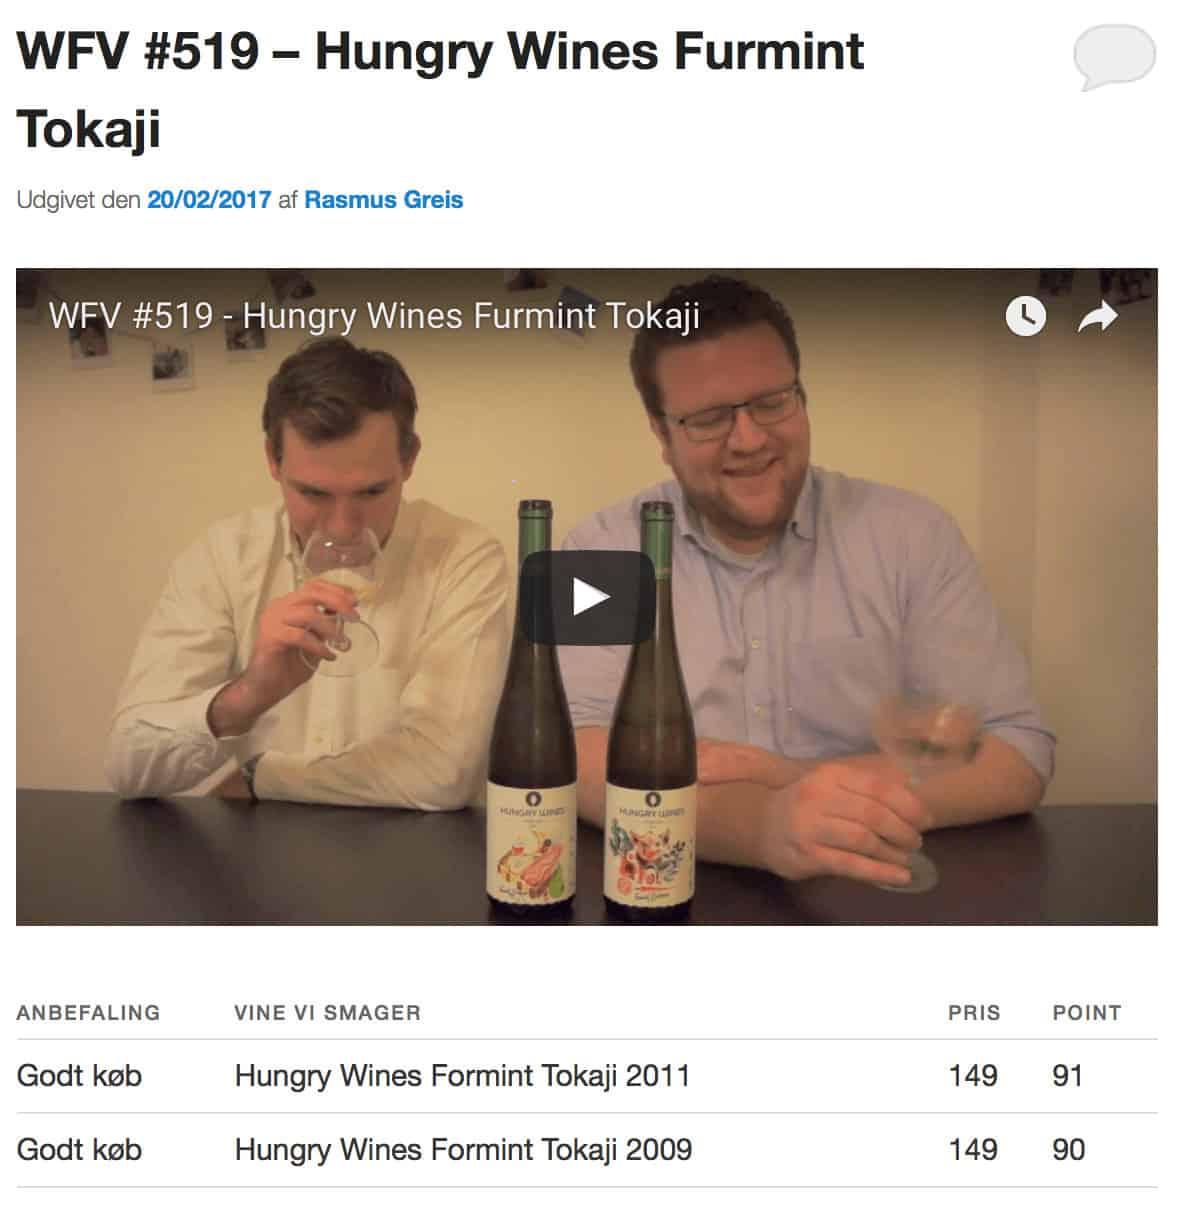 Splendid Danish video review of Furmint Barrique!